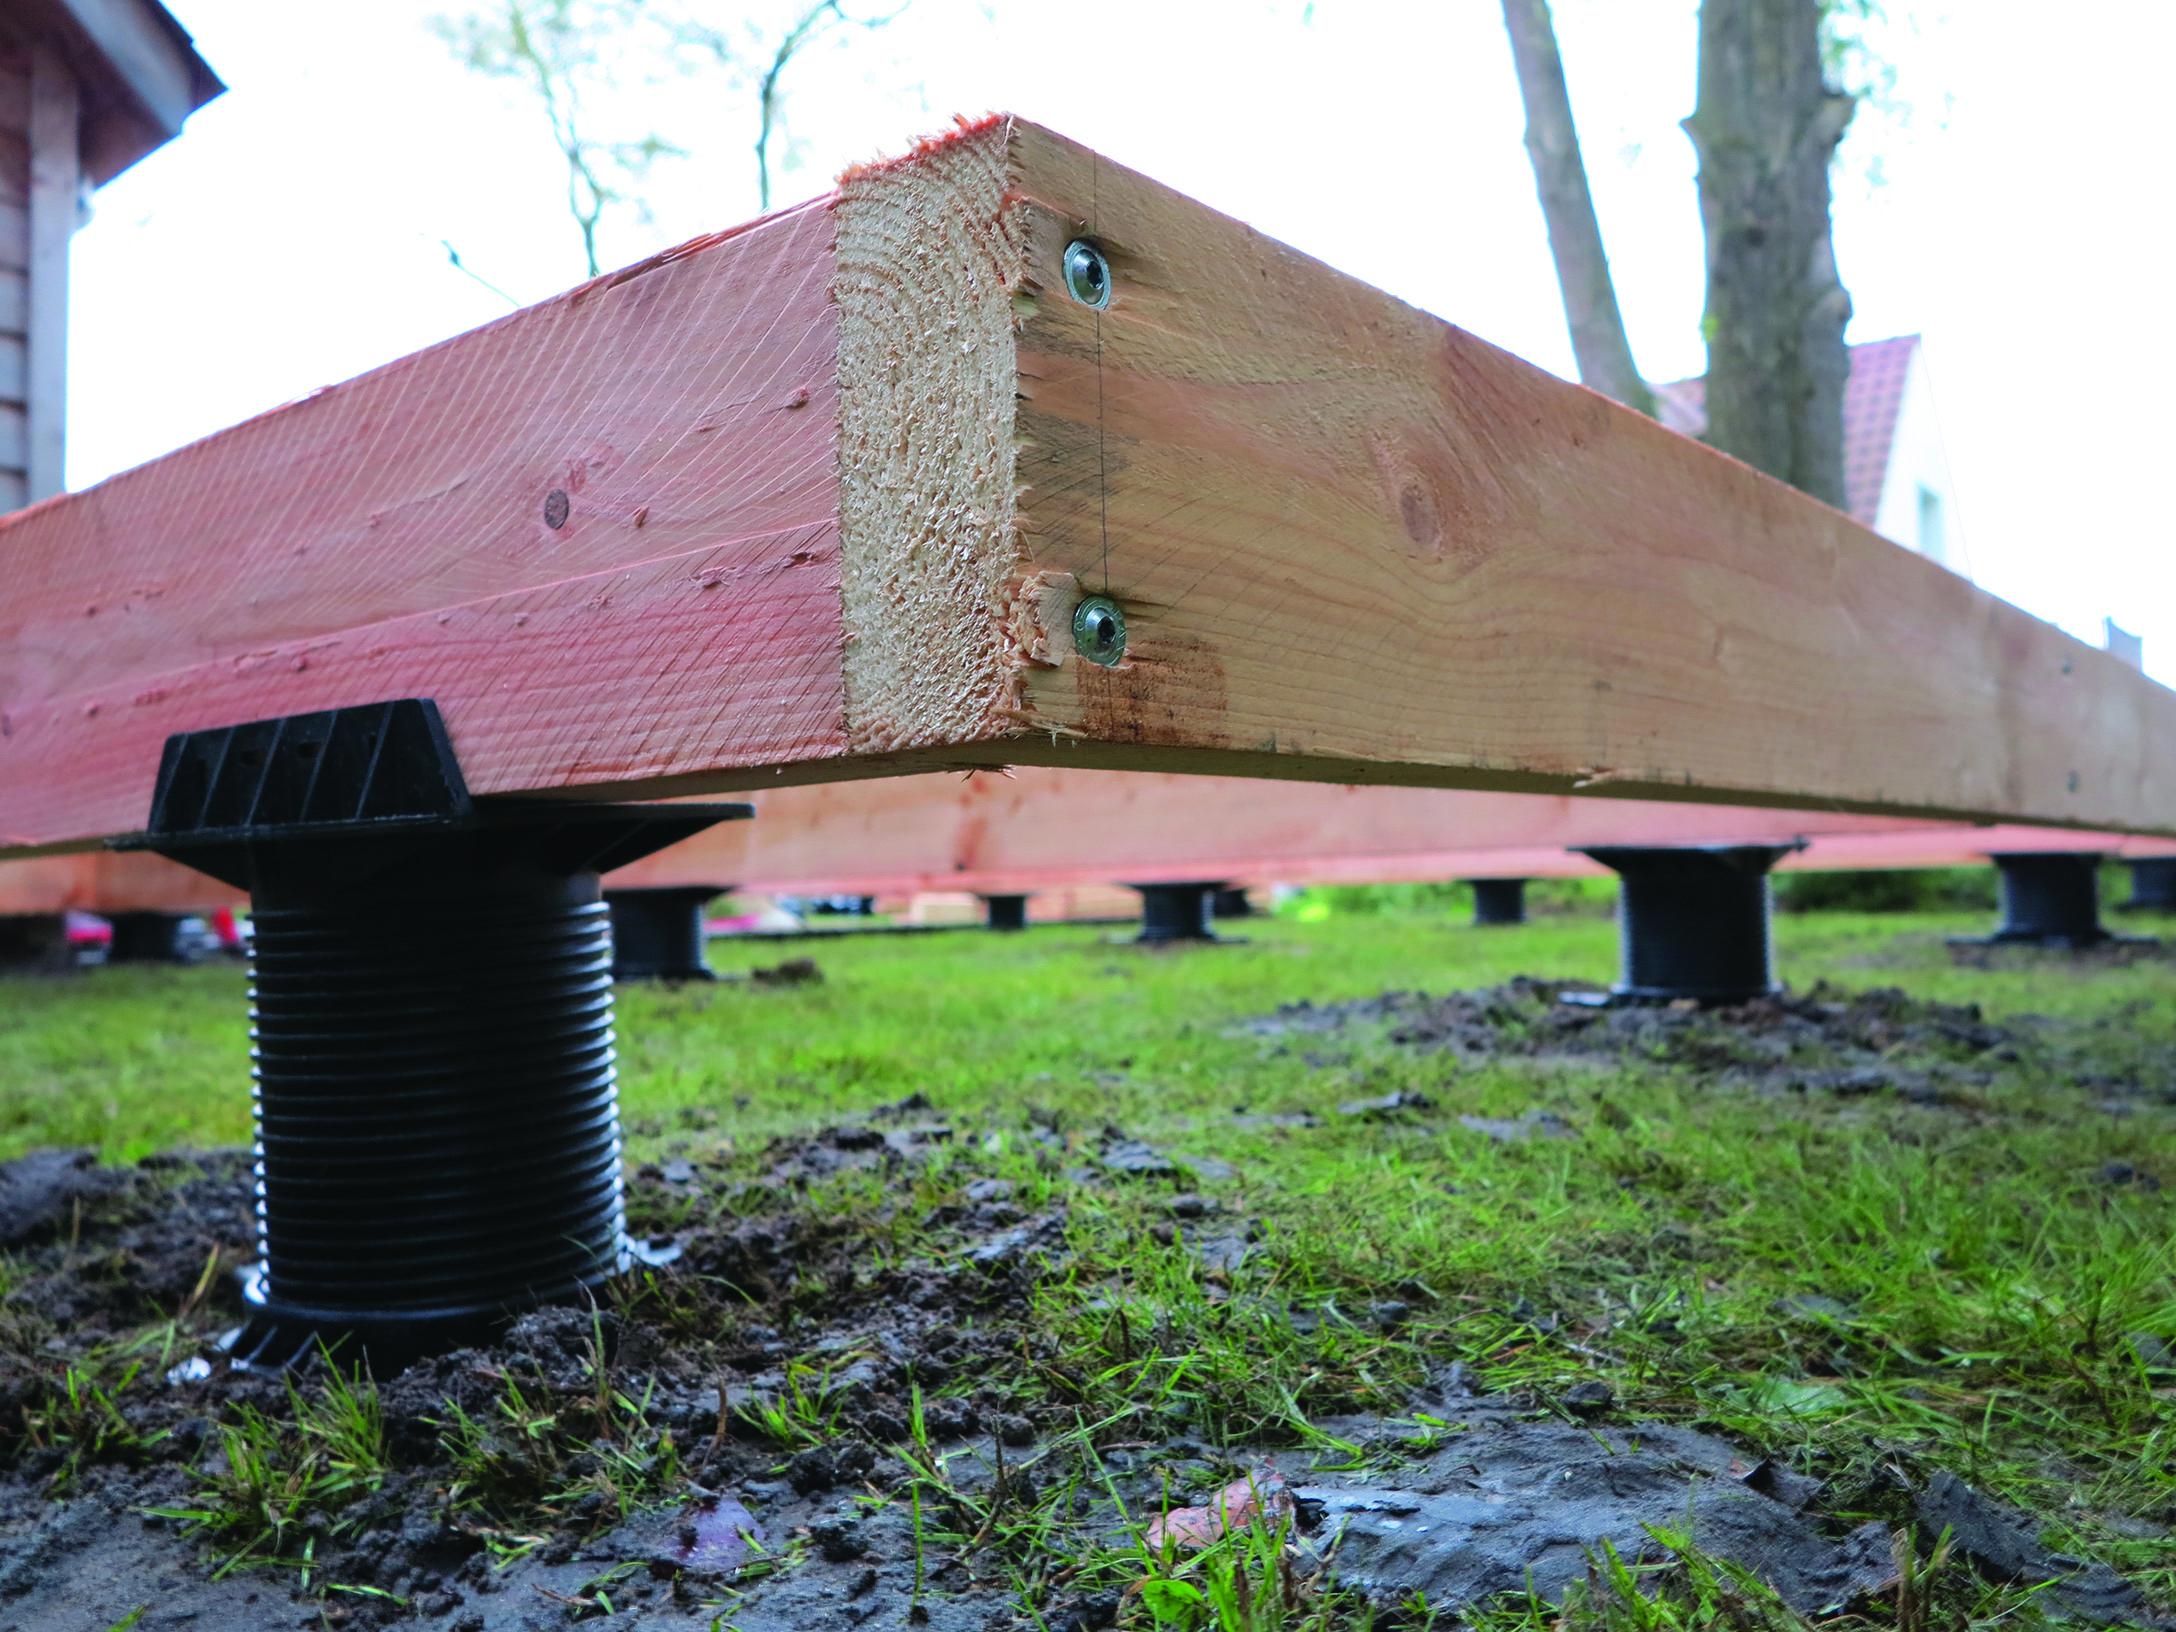 Construction De Terrasse, Abri De Jardin Avec Des Fondations ... destiné Fondation Abri De Jardin